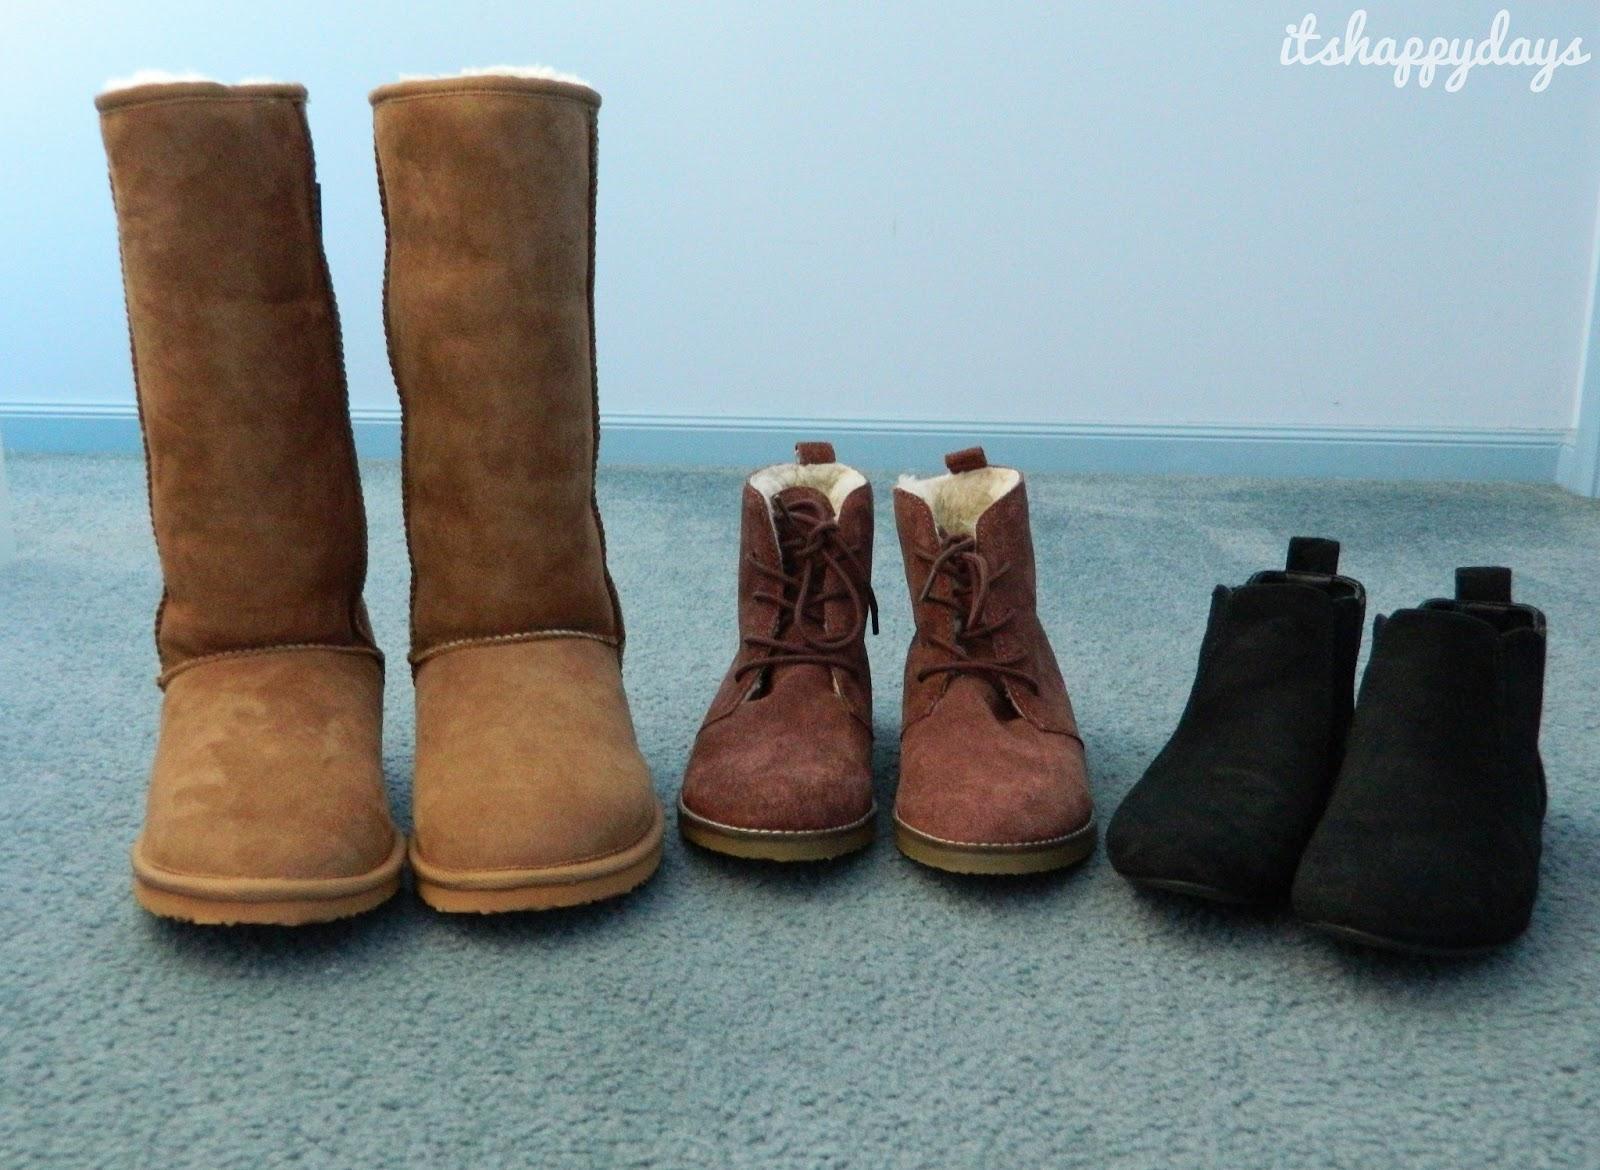 cf0c6f6c15c4c it's happy days: Winter boots haul: Winterworth, Zara, Wanted Shoes